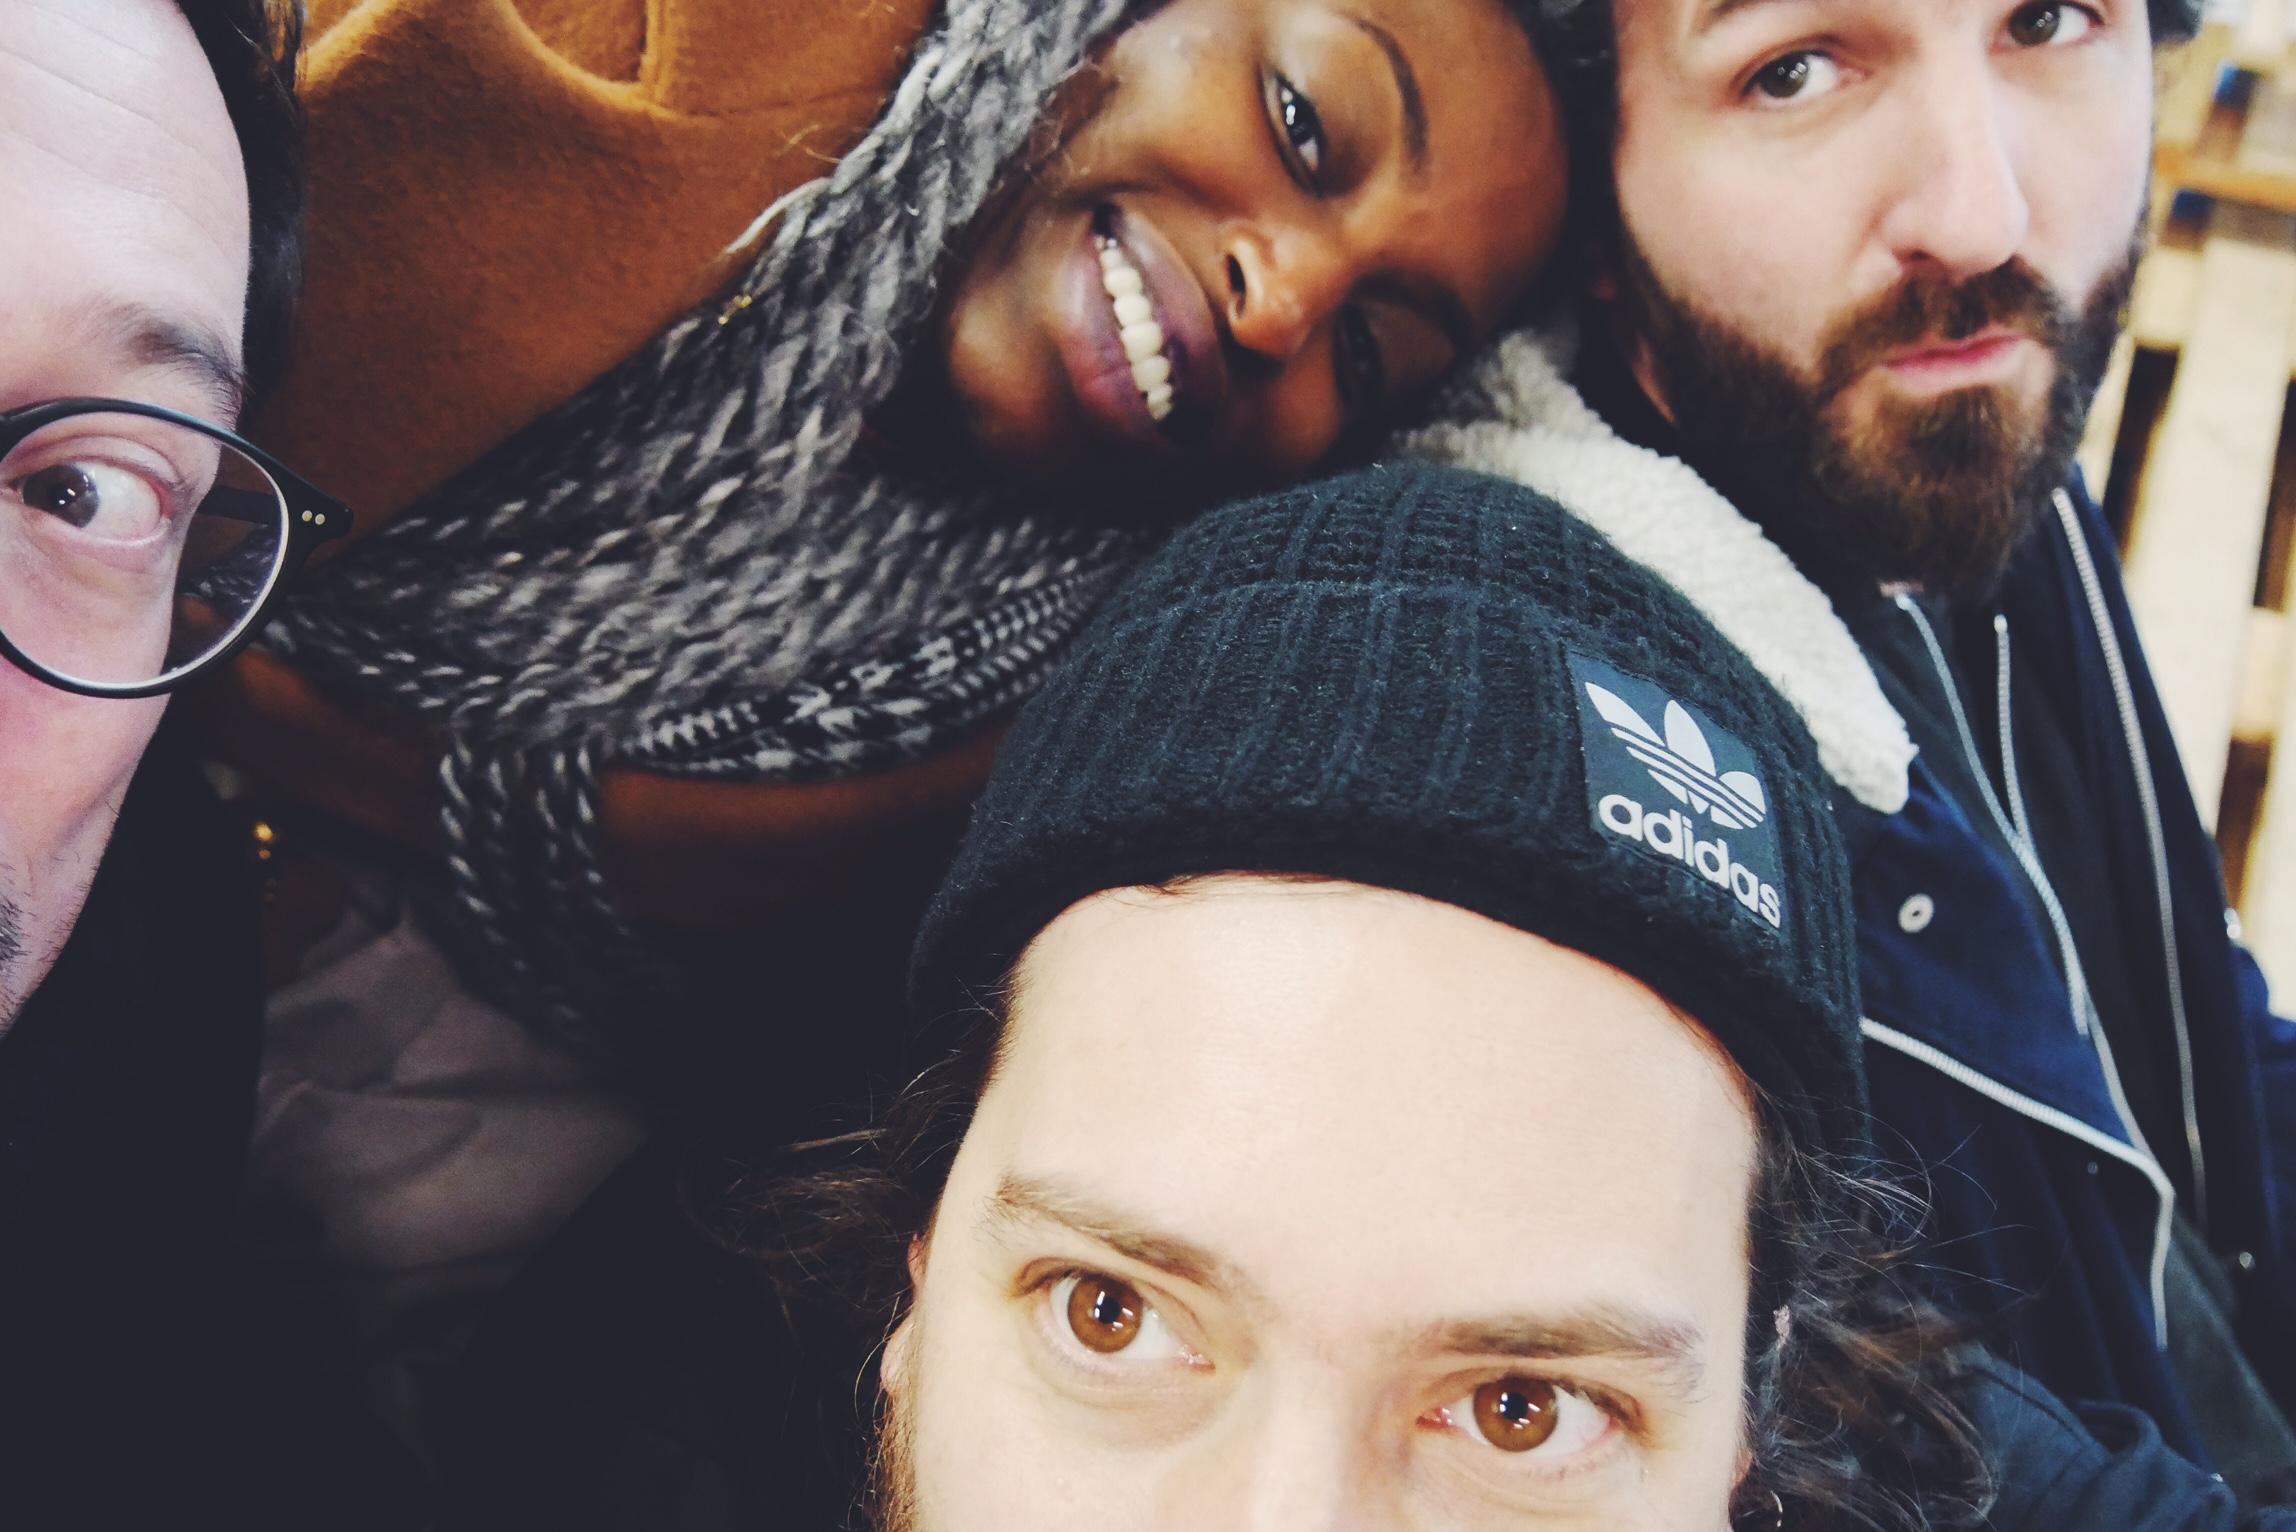 Rocky-music-band-interview-soft-machines-Inès-Kokou-Laurent-Tom-Olivier-selfie-original-photo-usofparis-blog